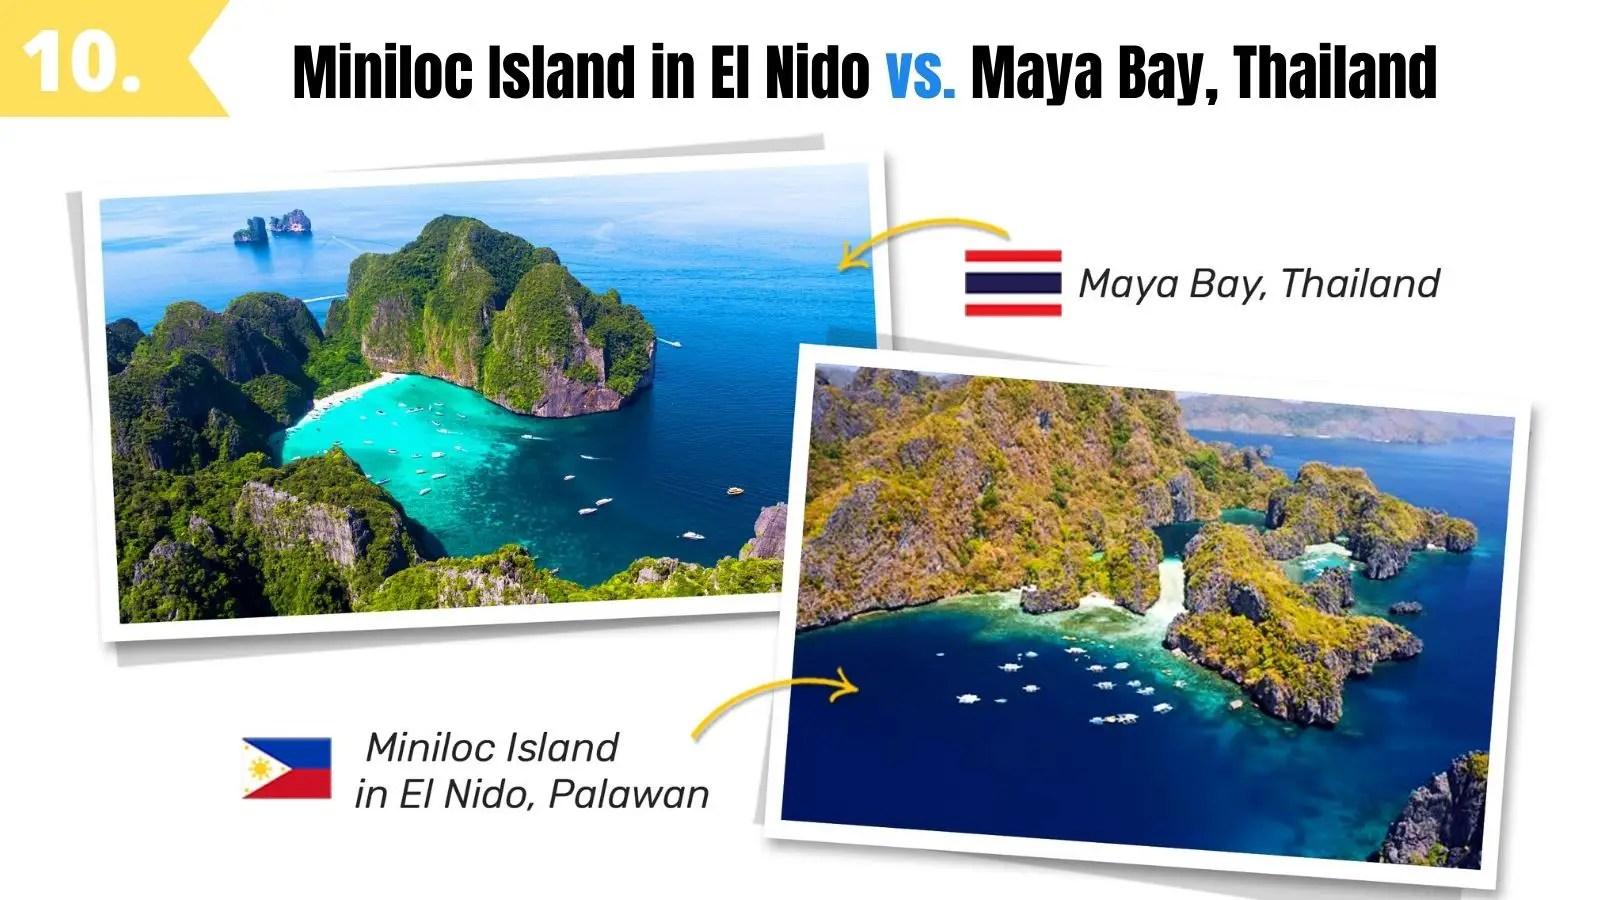 miniloc island el nido palawan vs maya bay thailand